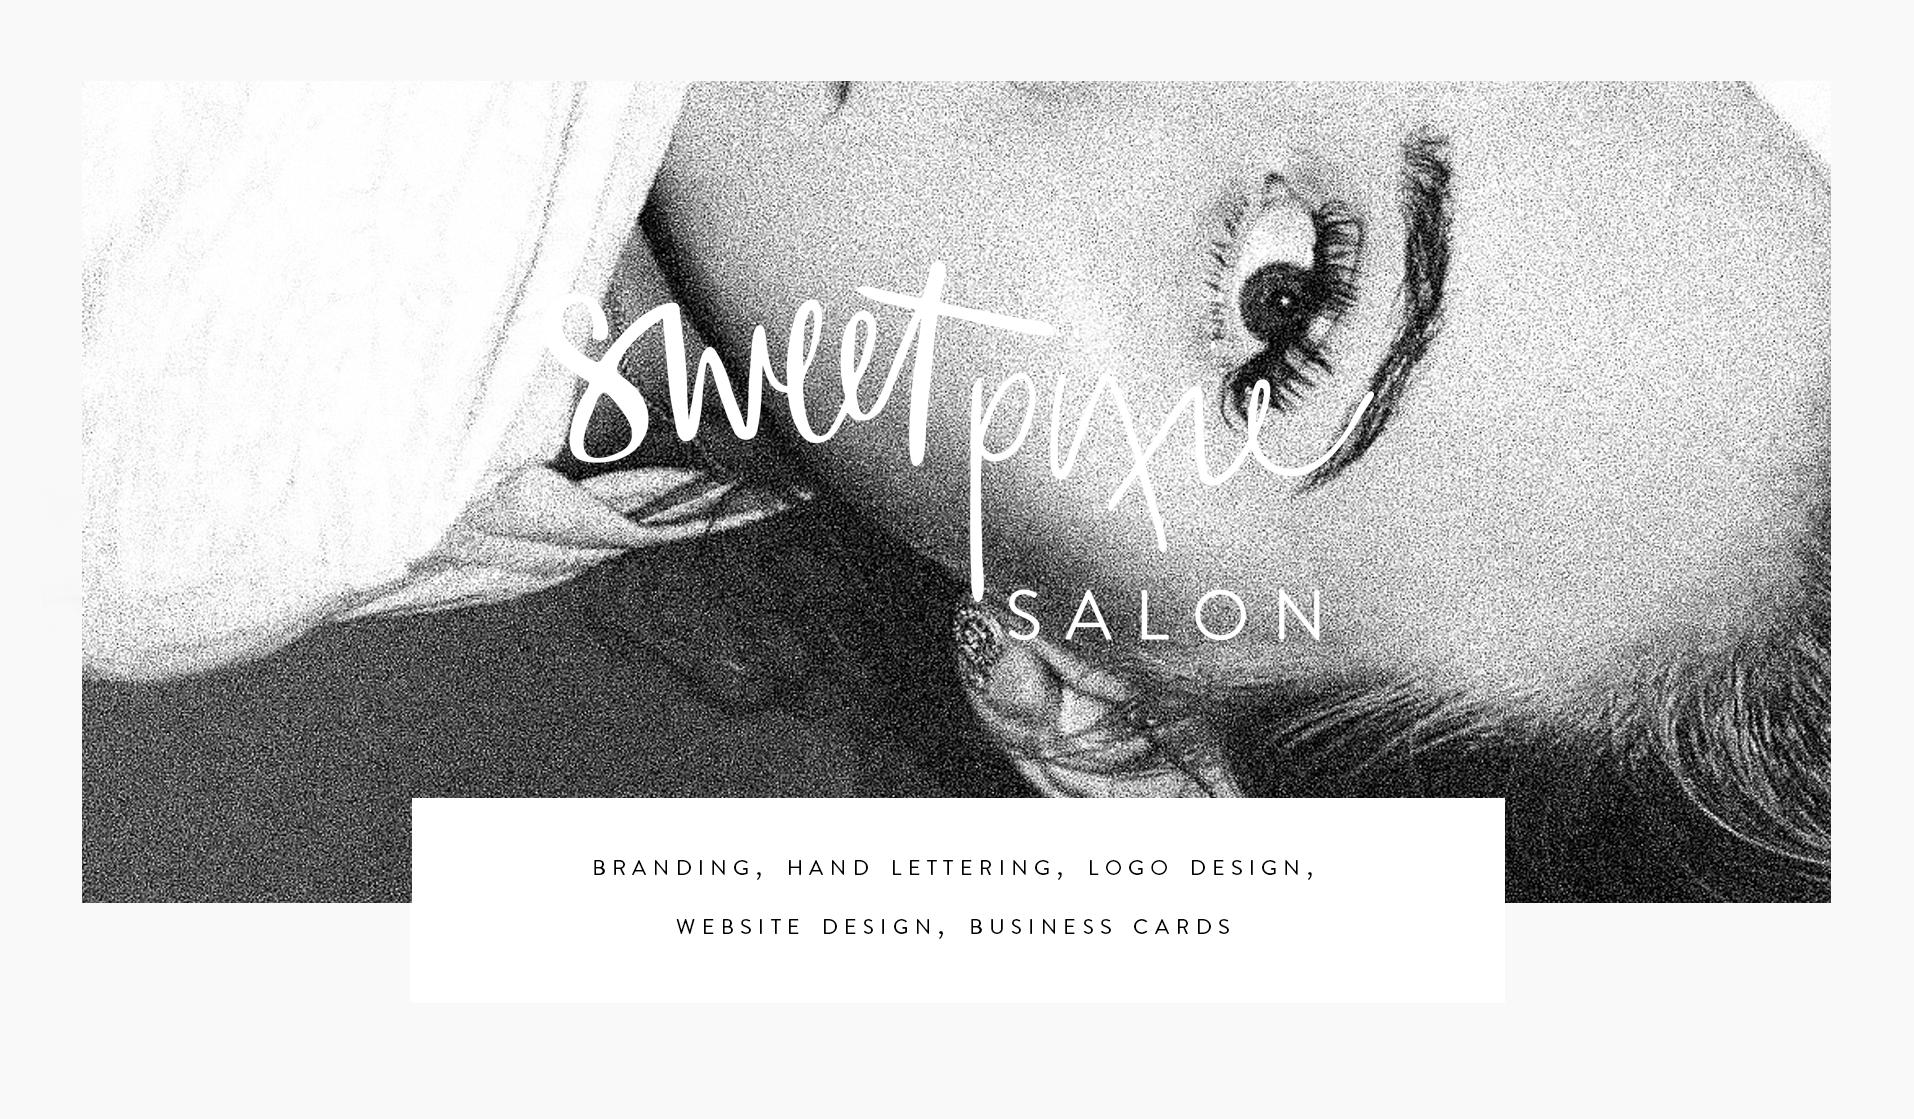 SWEET_PIXIE_SALON.png